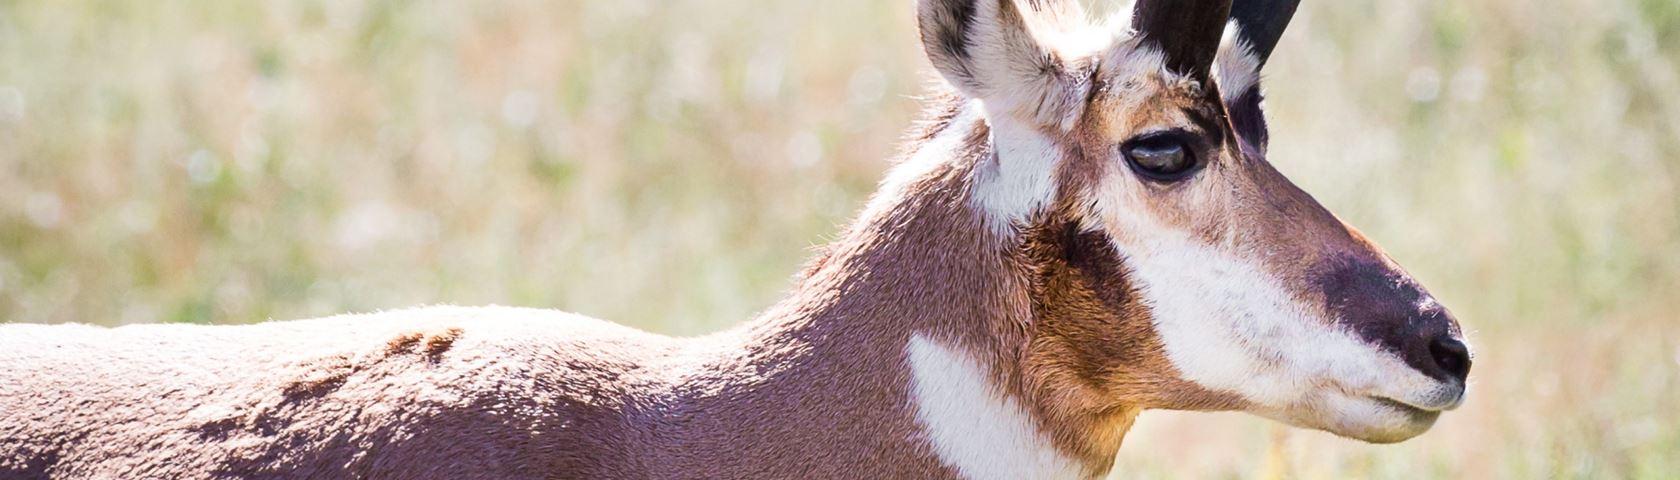 Pronghorn Antelpoe